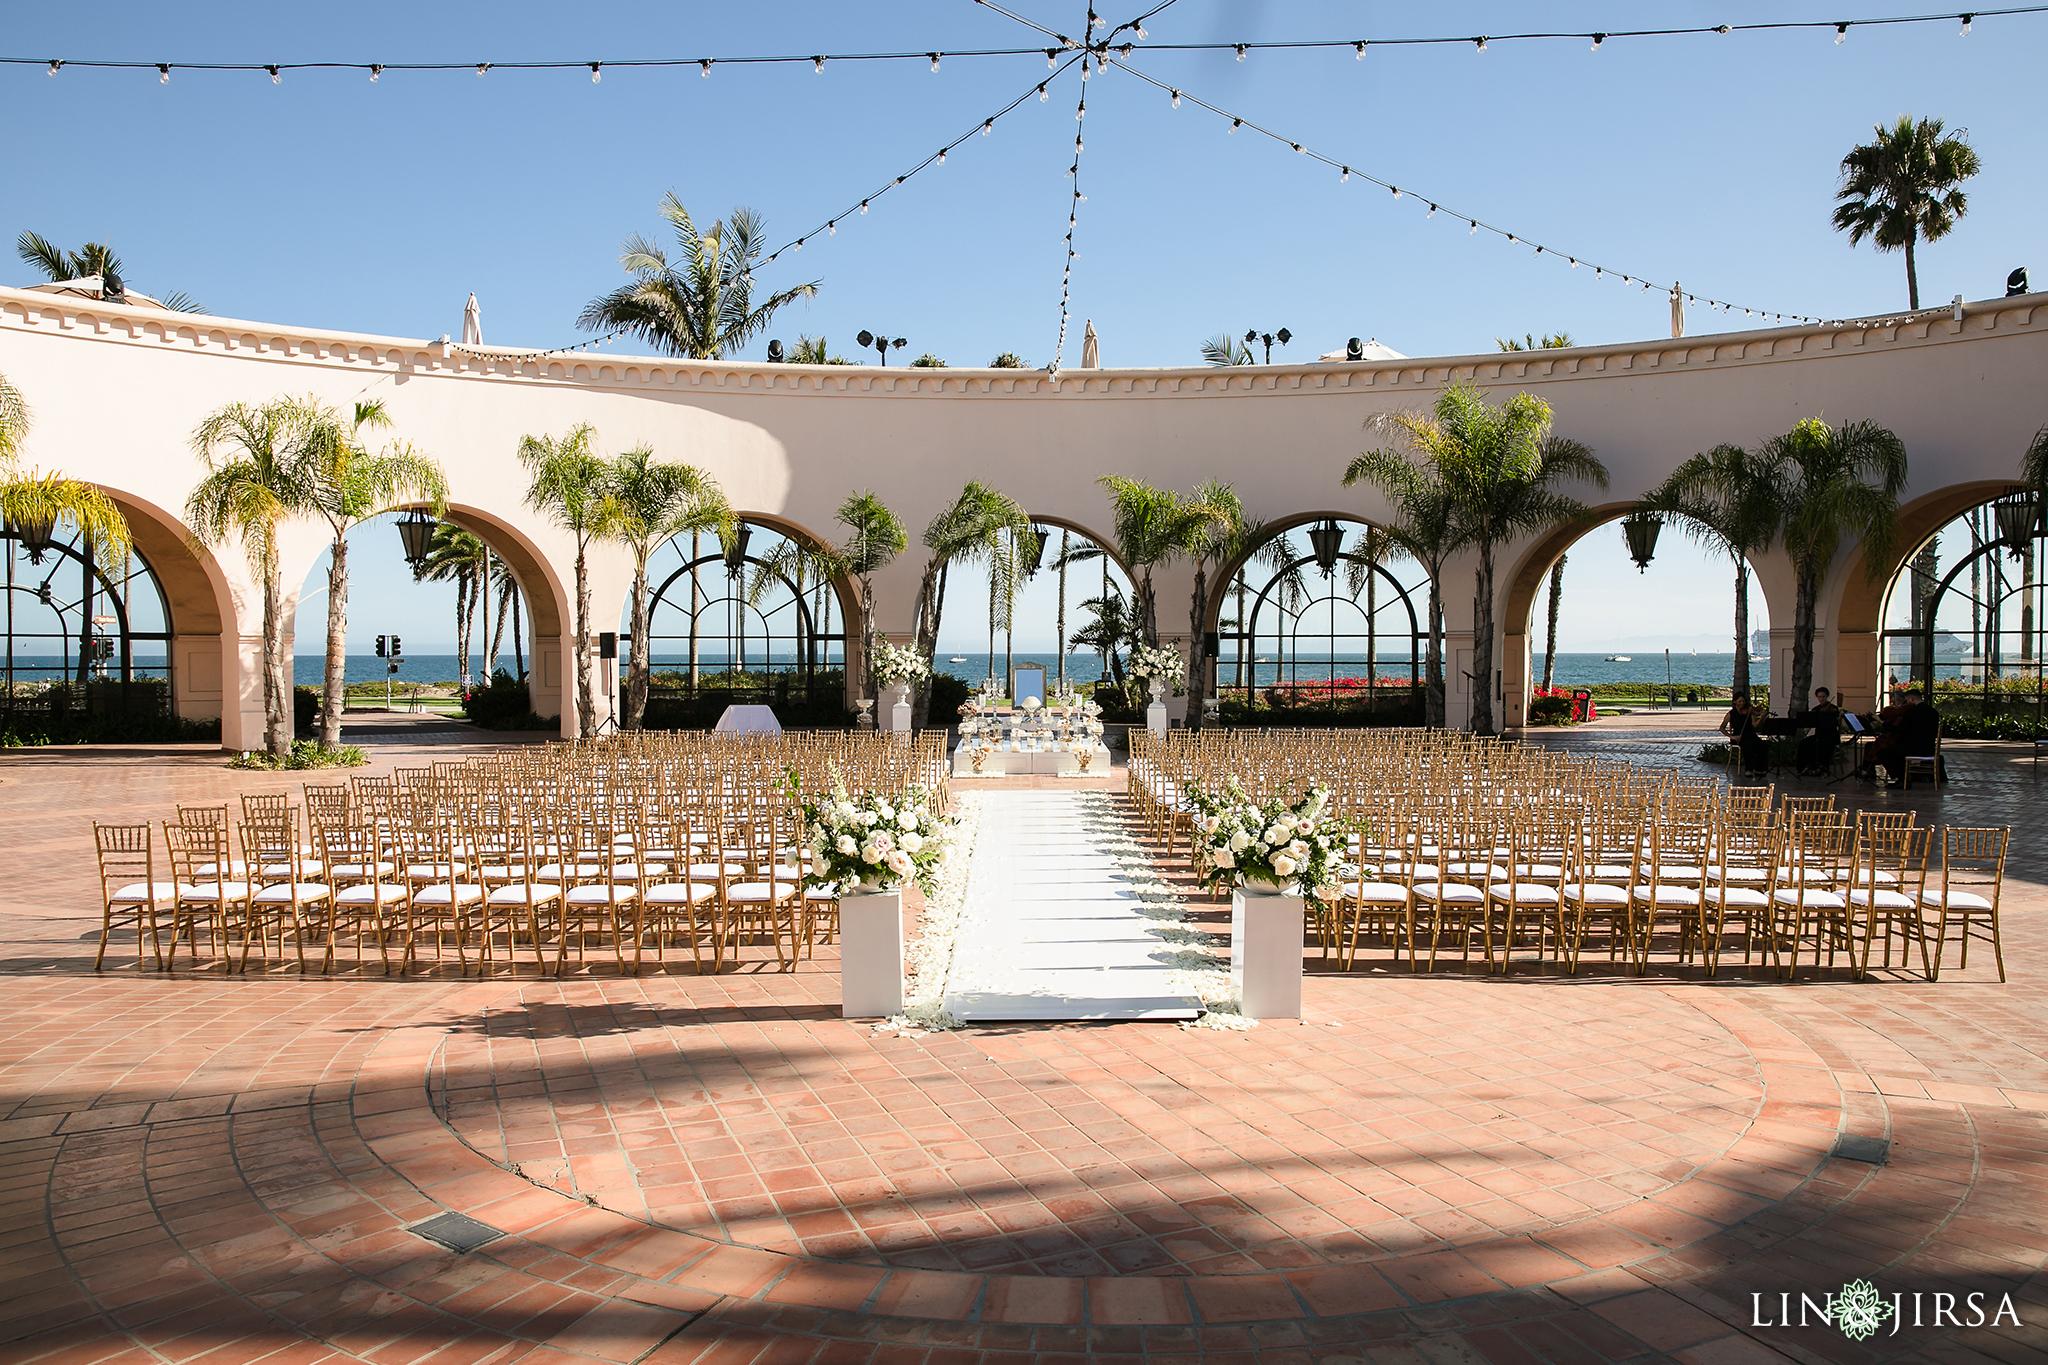 02 Wedding Ceremony Sofreh Aghd Hilton Santa Barbara Beachfront Resort Wedding